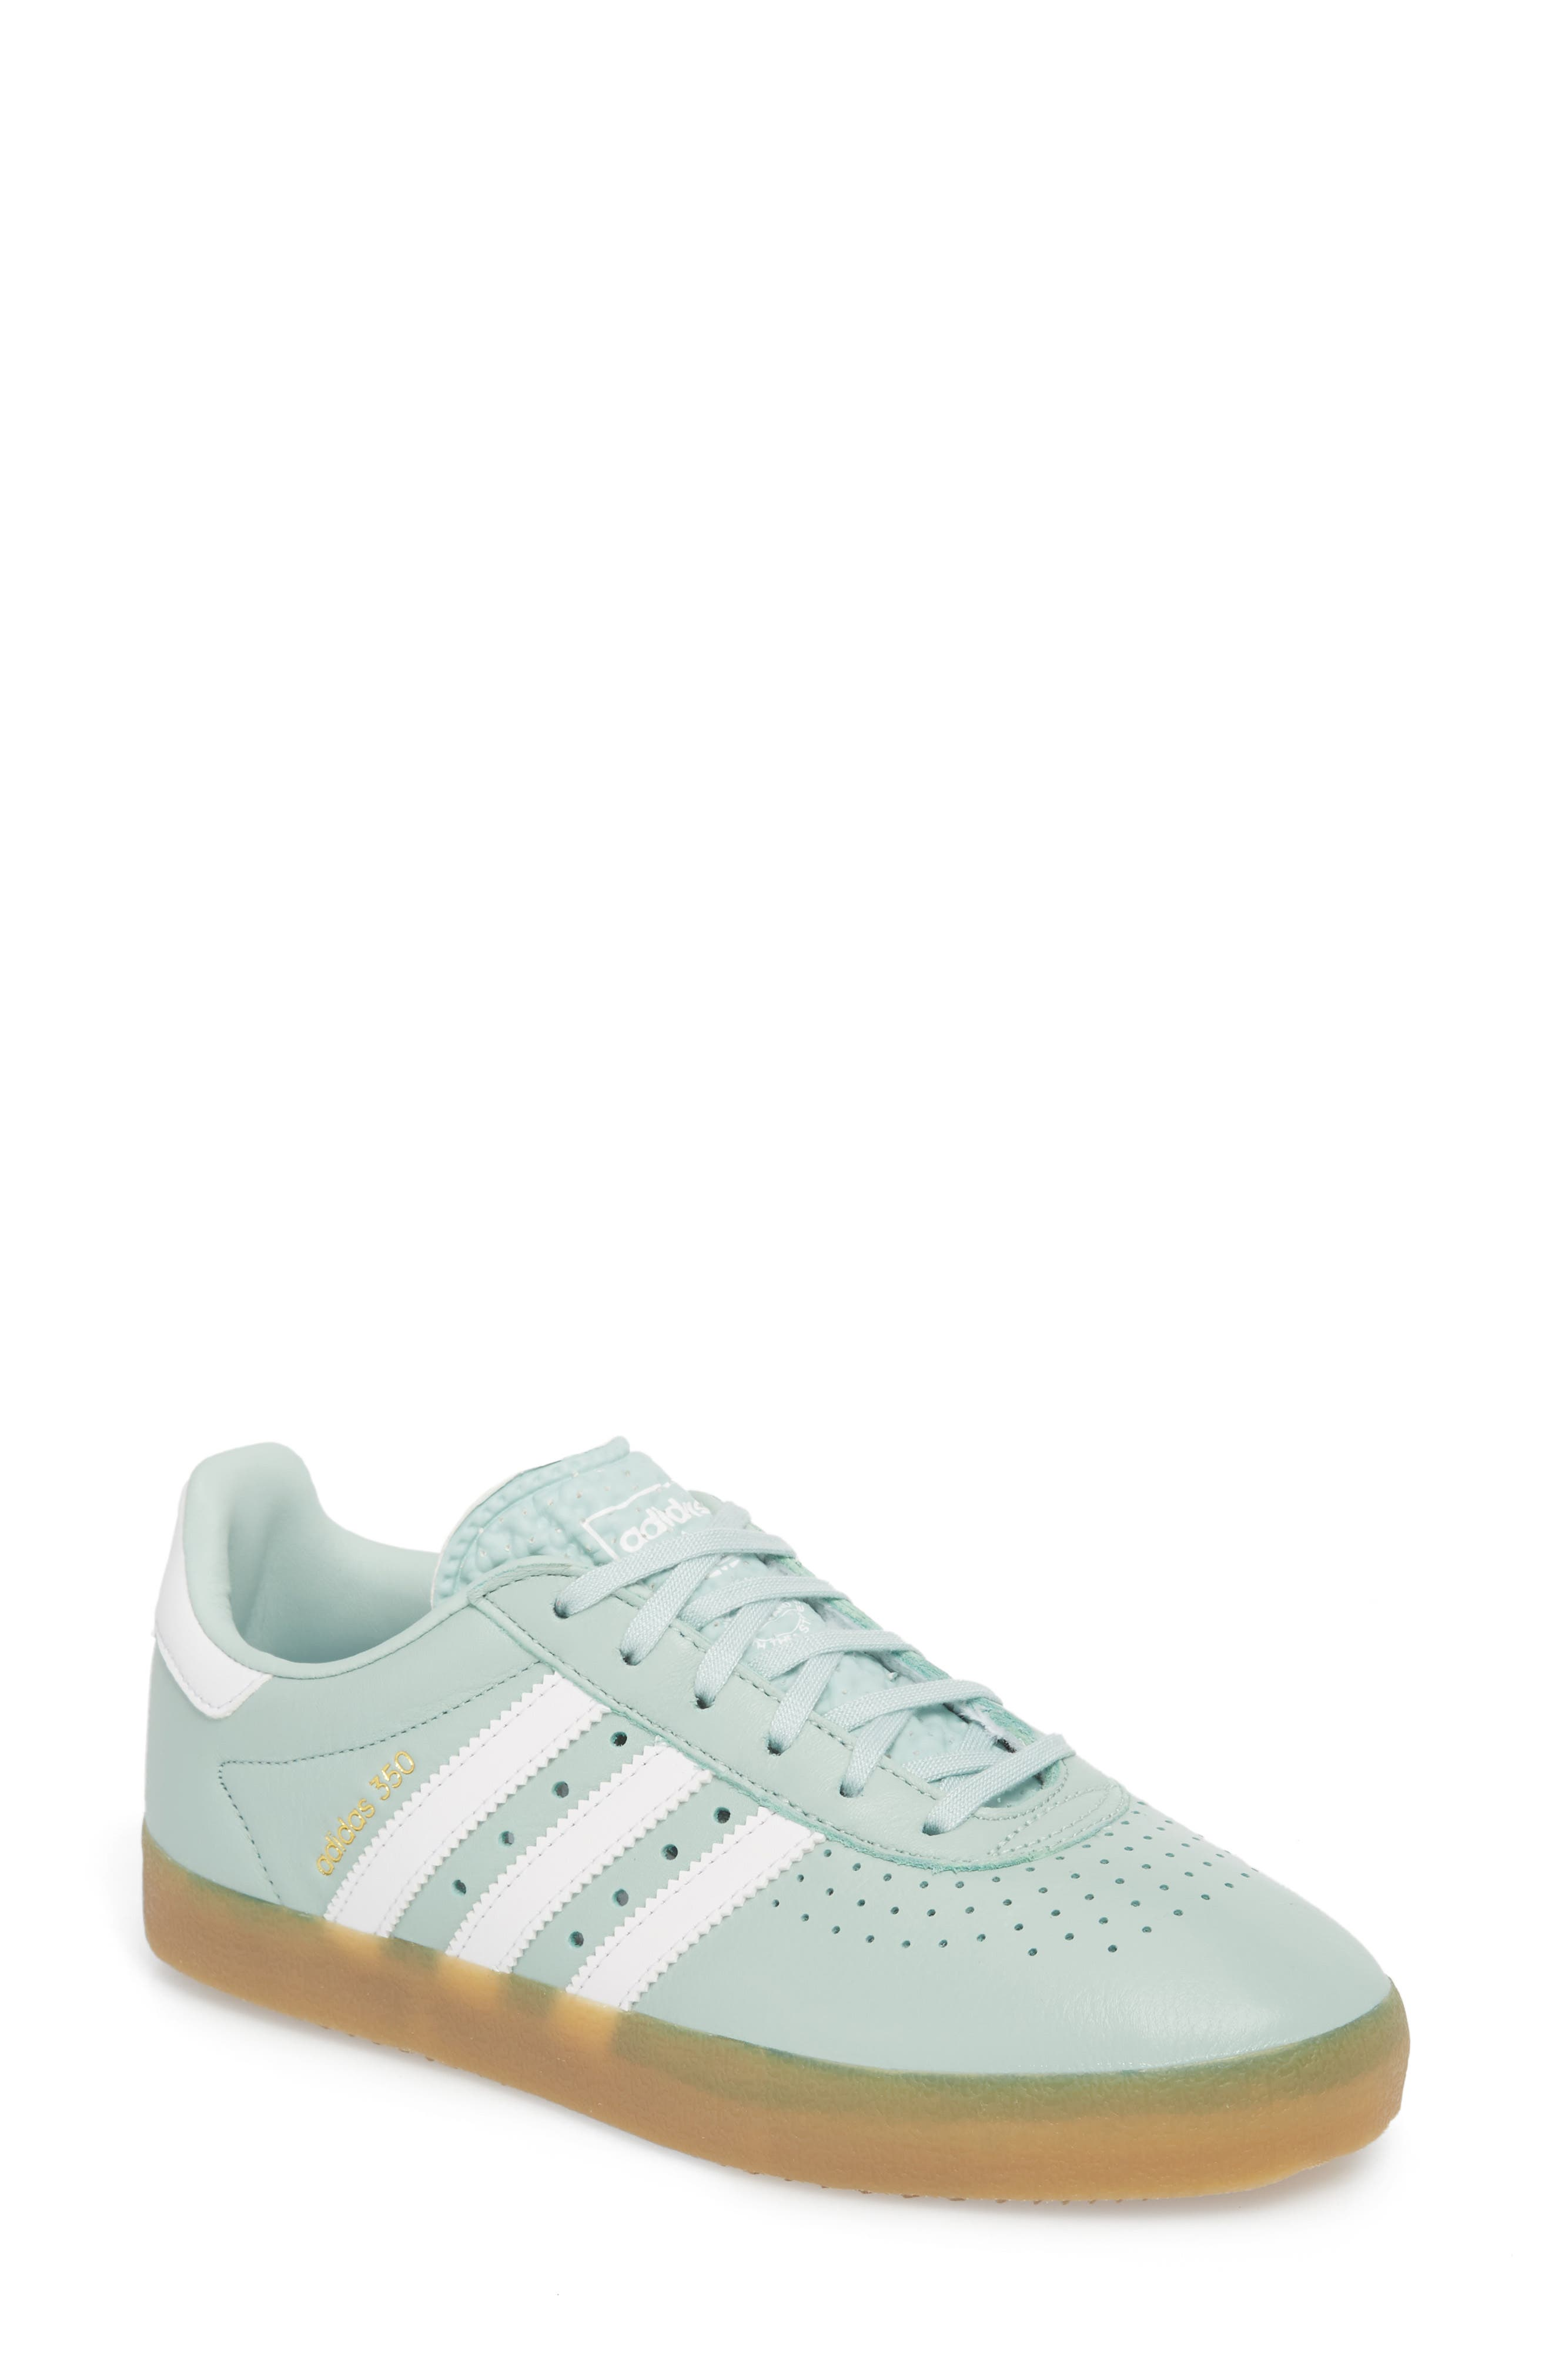 350 Sneaker,                         Main,                         color, Ash Green/ White/ Gum